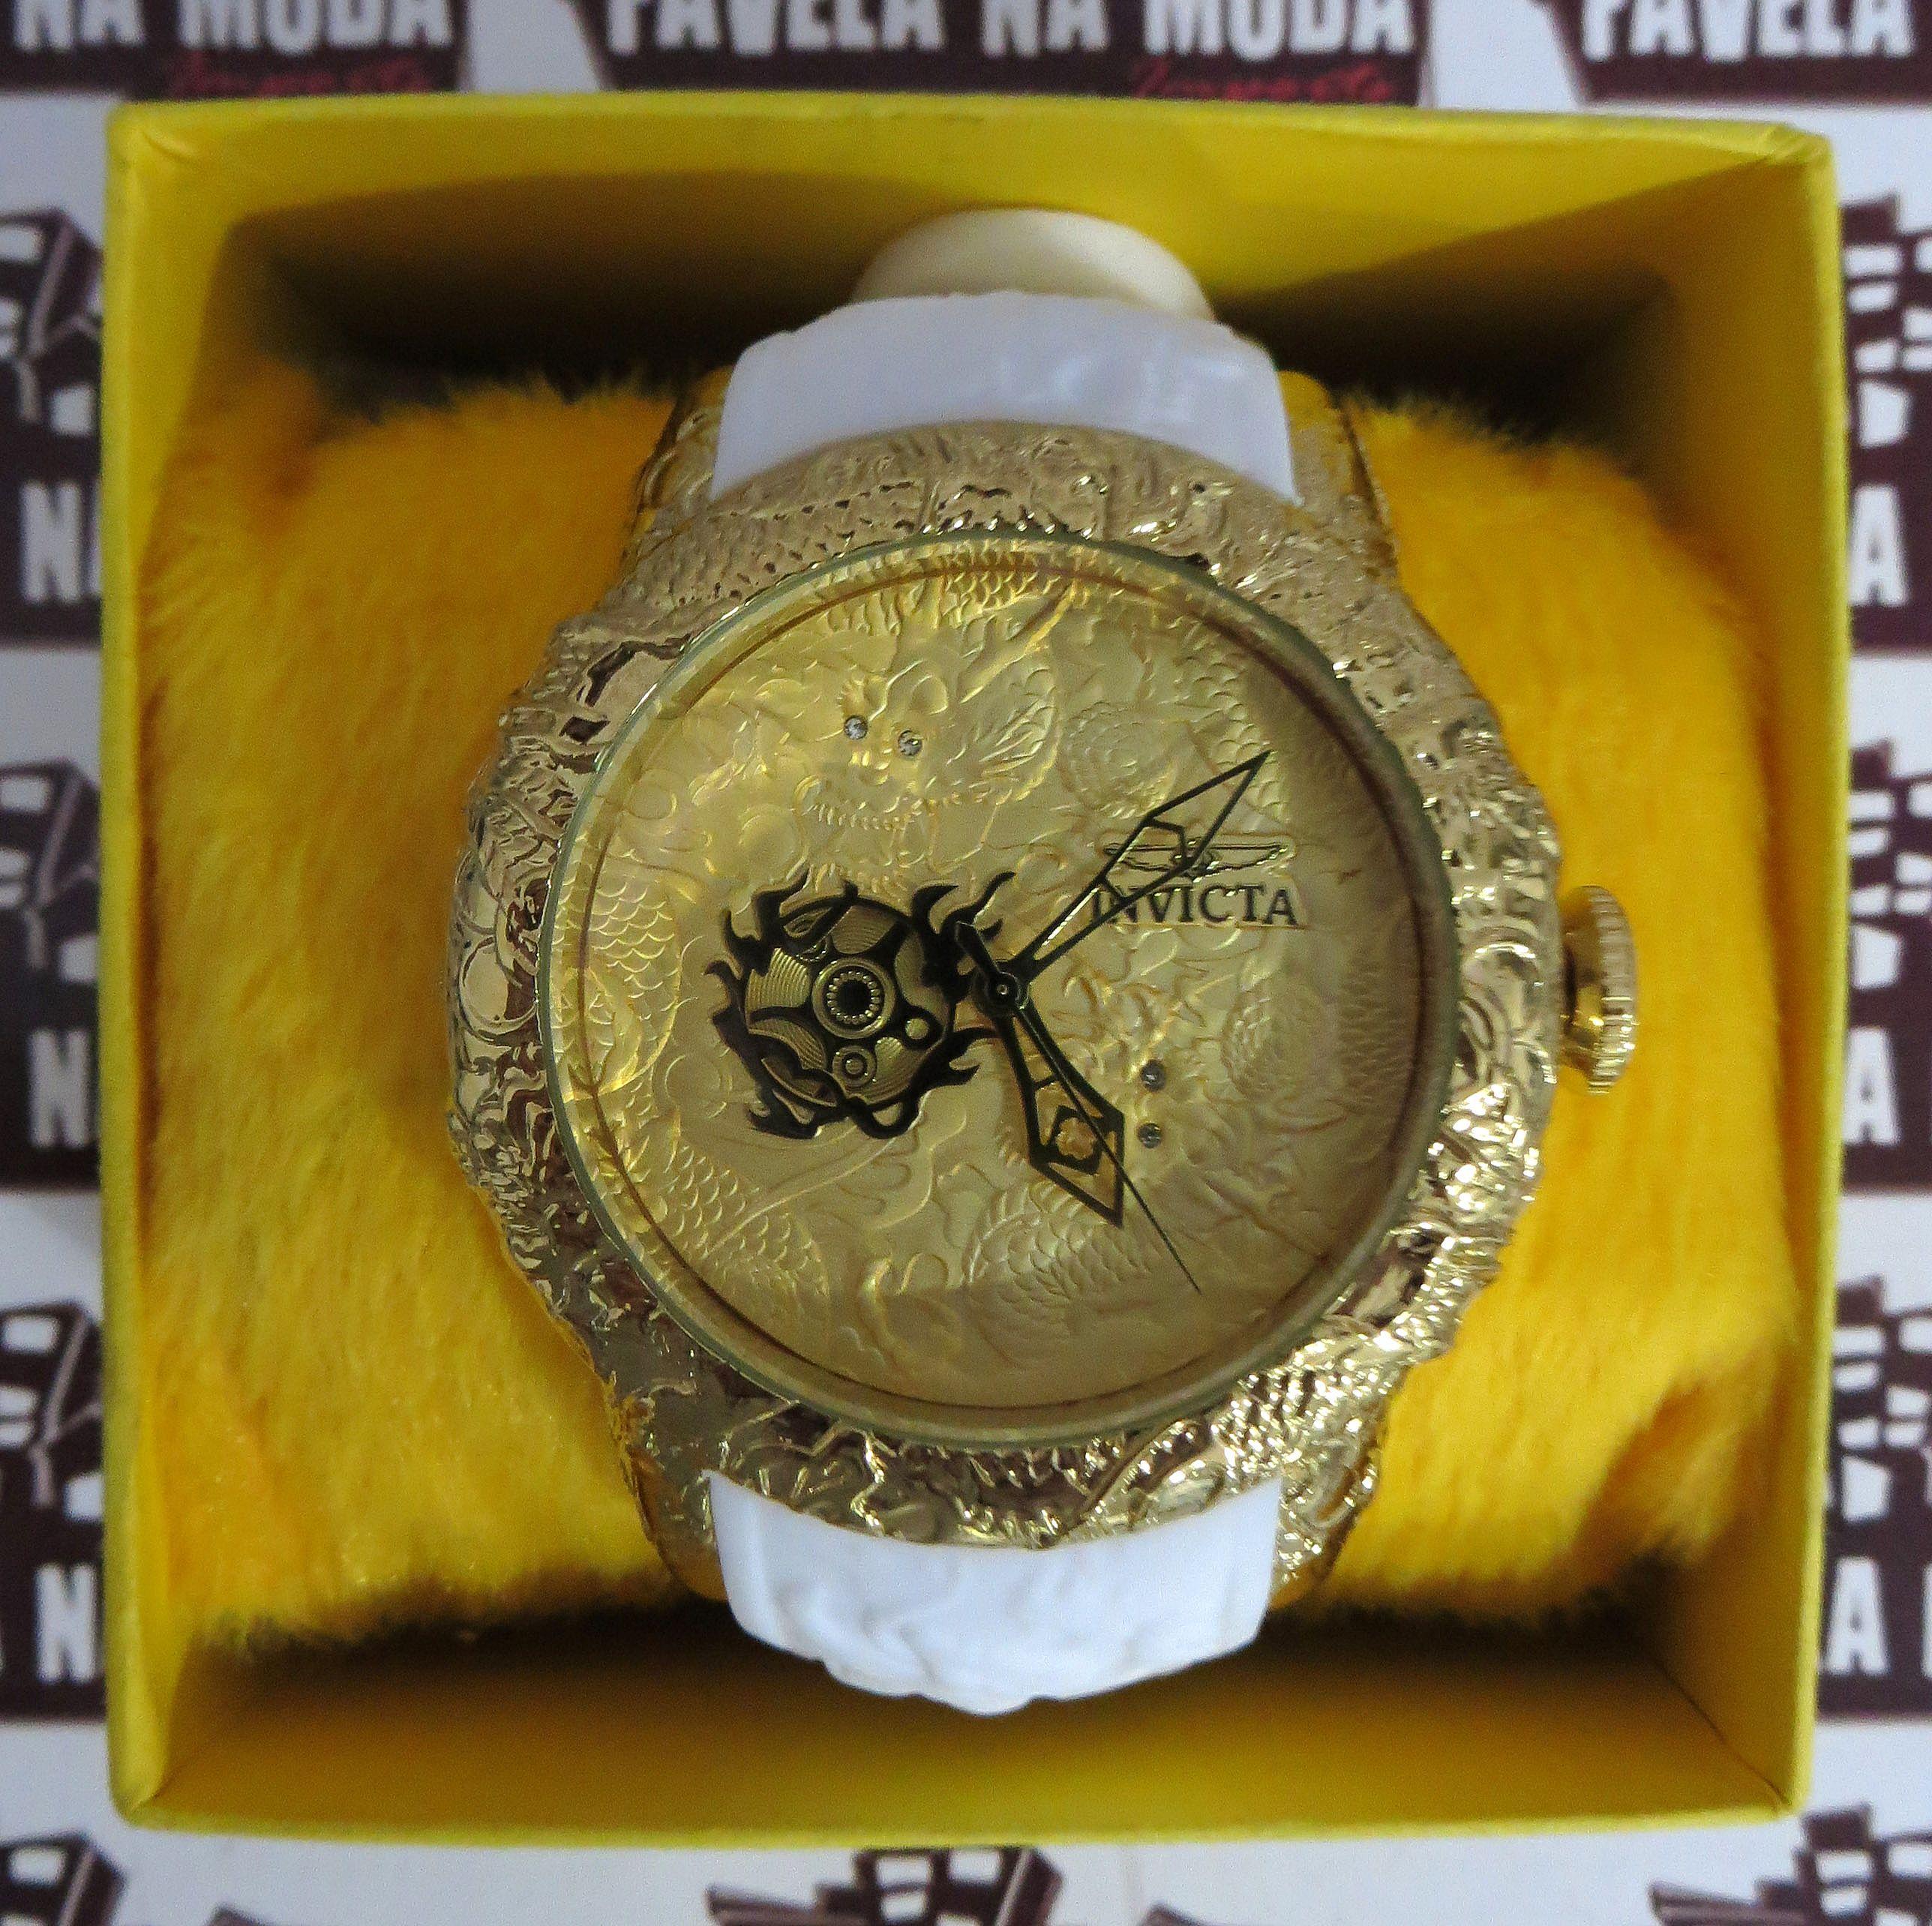 189d2e56c7c Relógio Invicta Yakuza Dragon S2 - Branco   Dourado